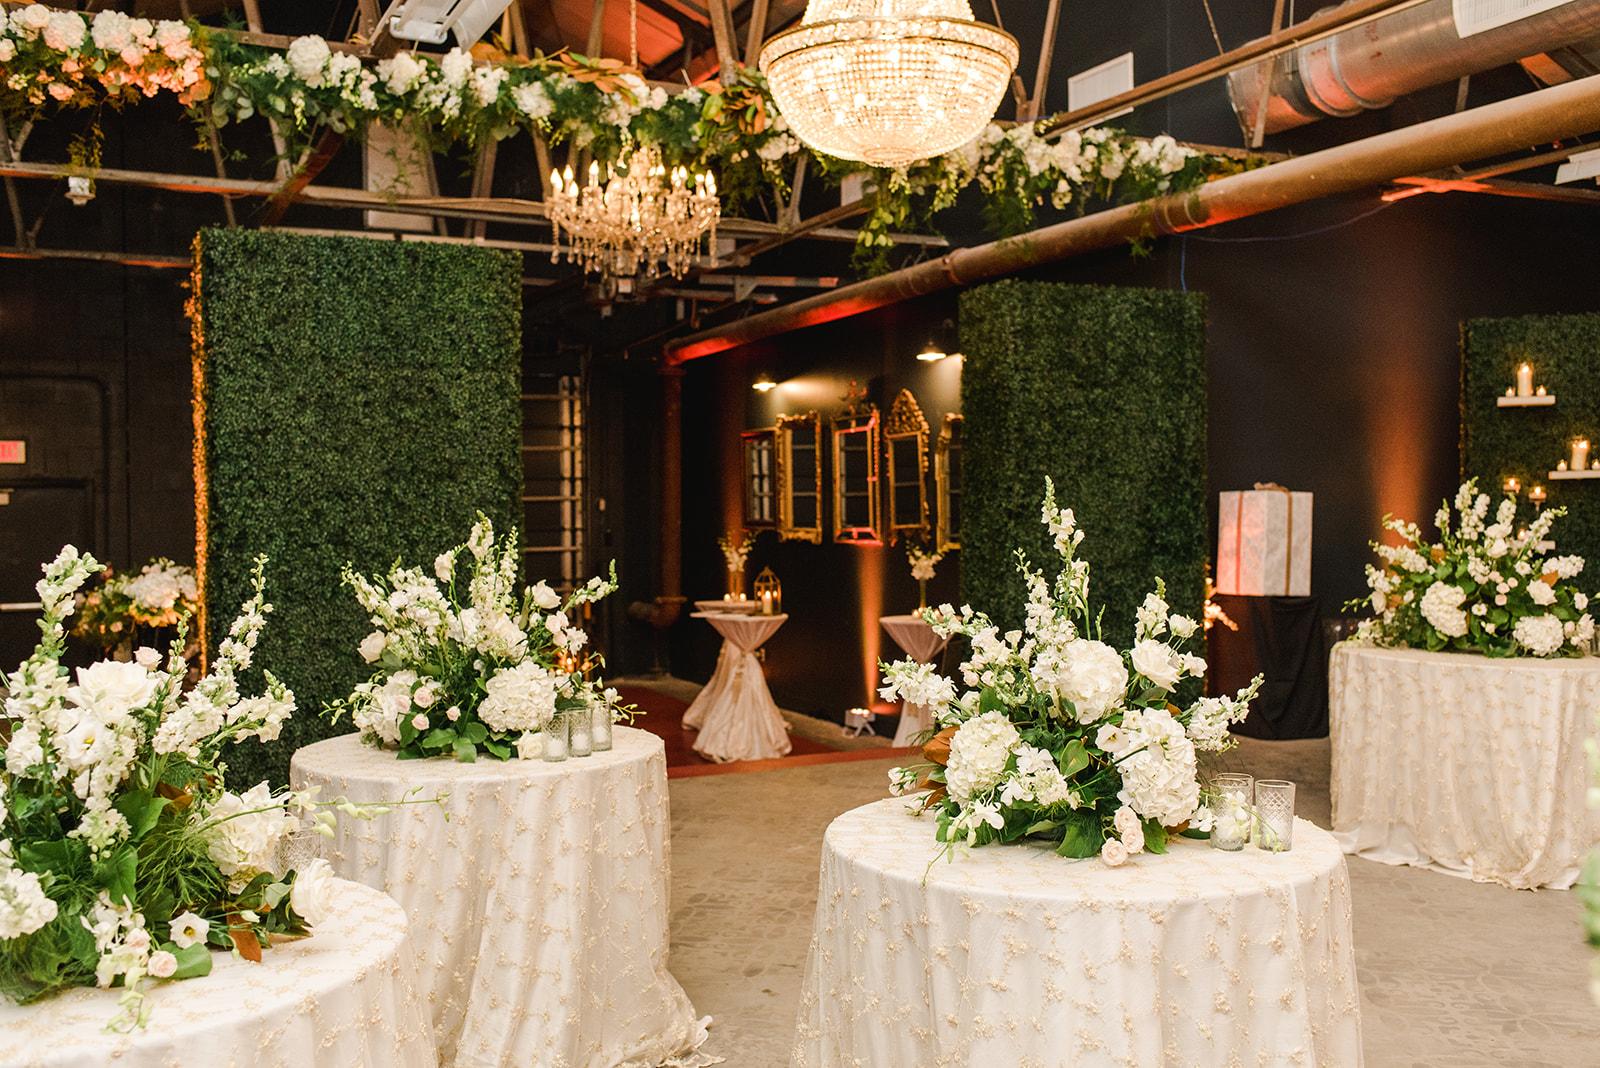 Copy of Quick Wedding - 02 - credit Brooke Boyd.jpg